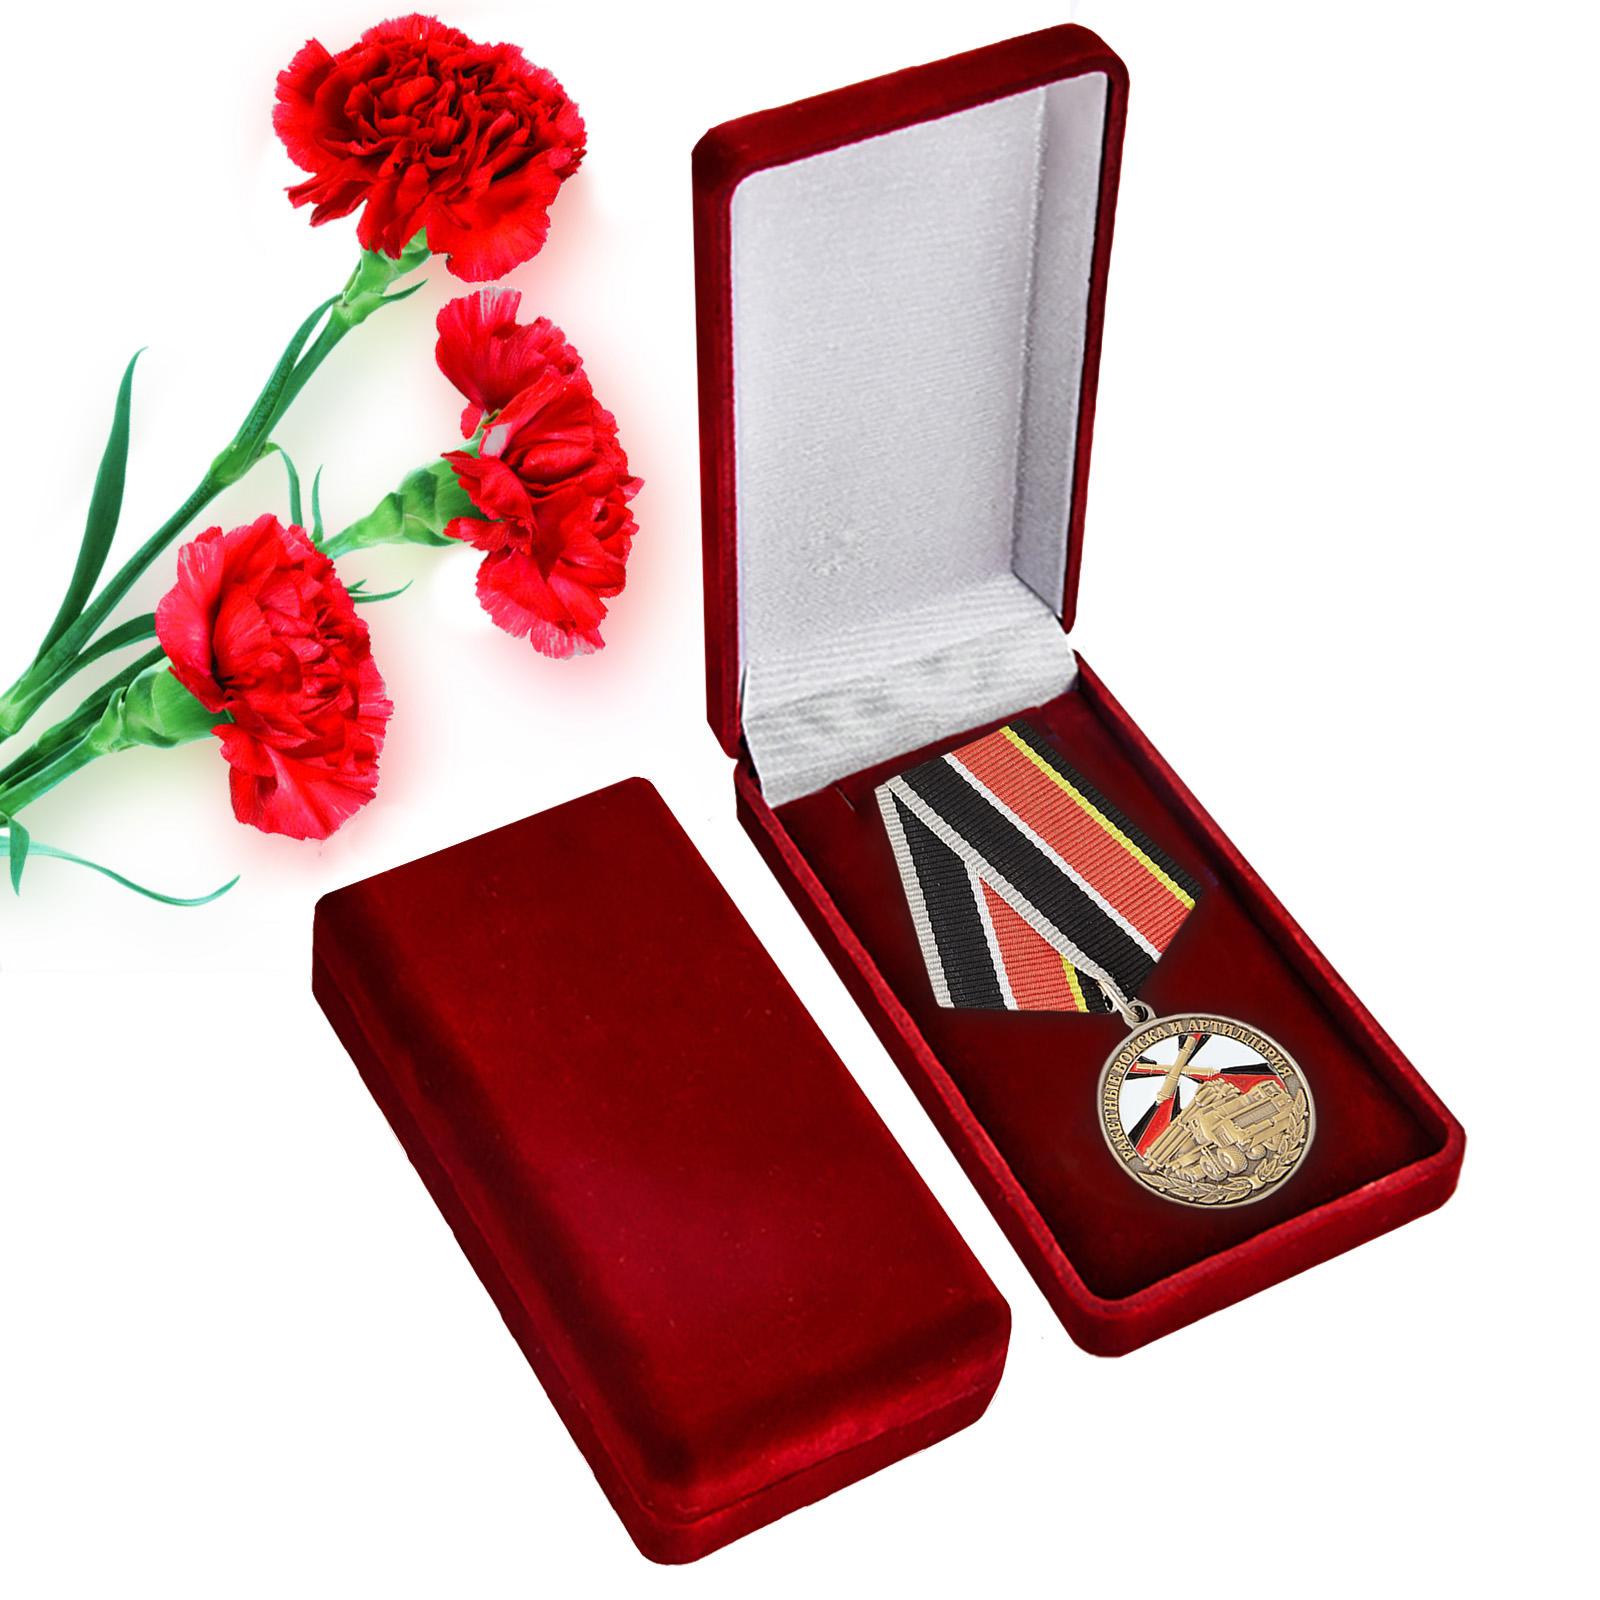 Медали РВиА по цене производителя – доставка по России и за рубеж